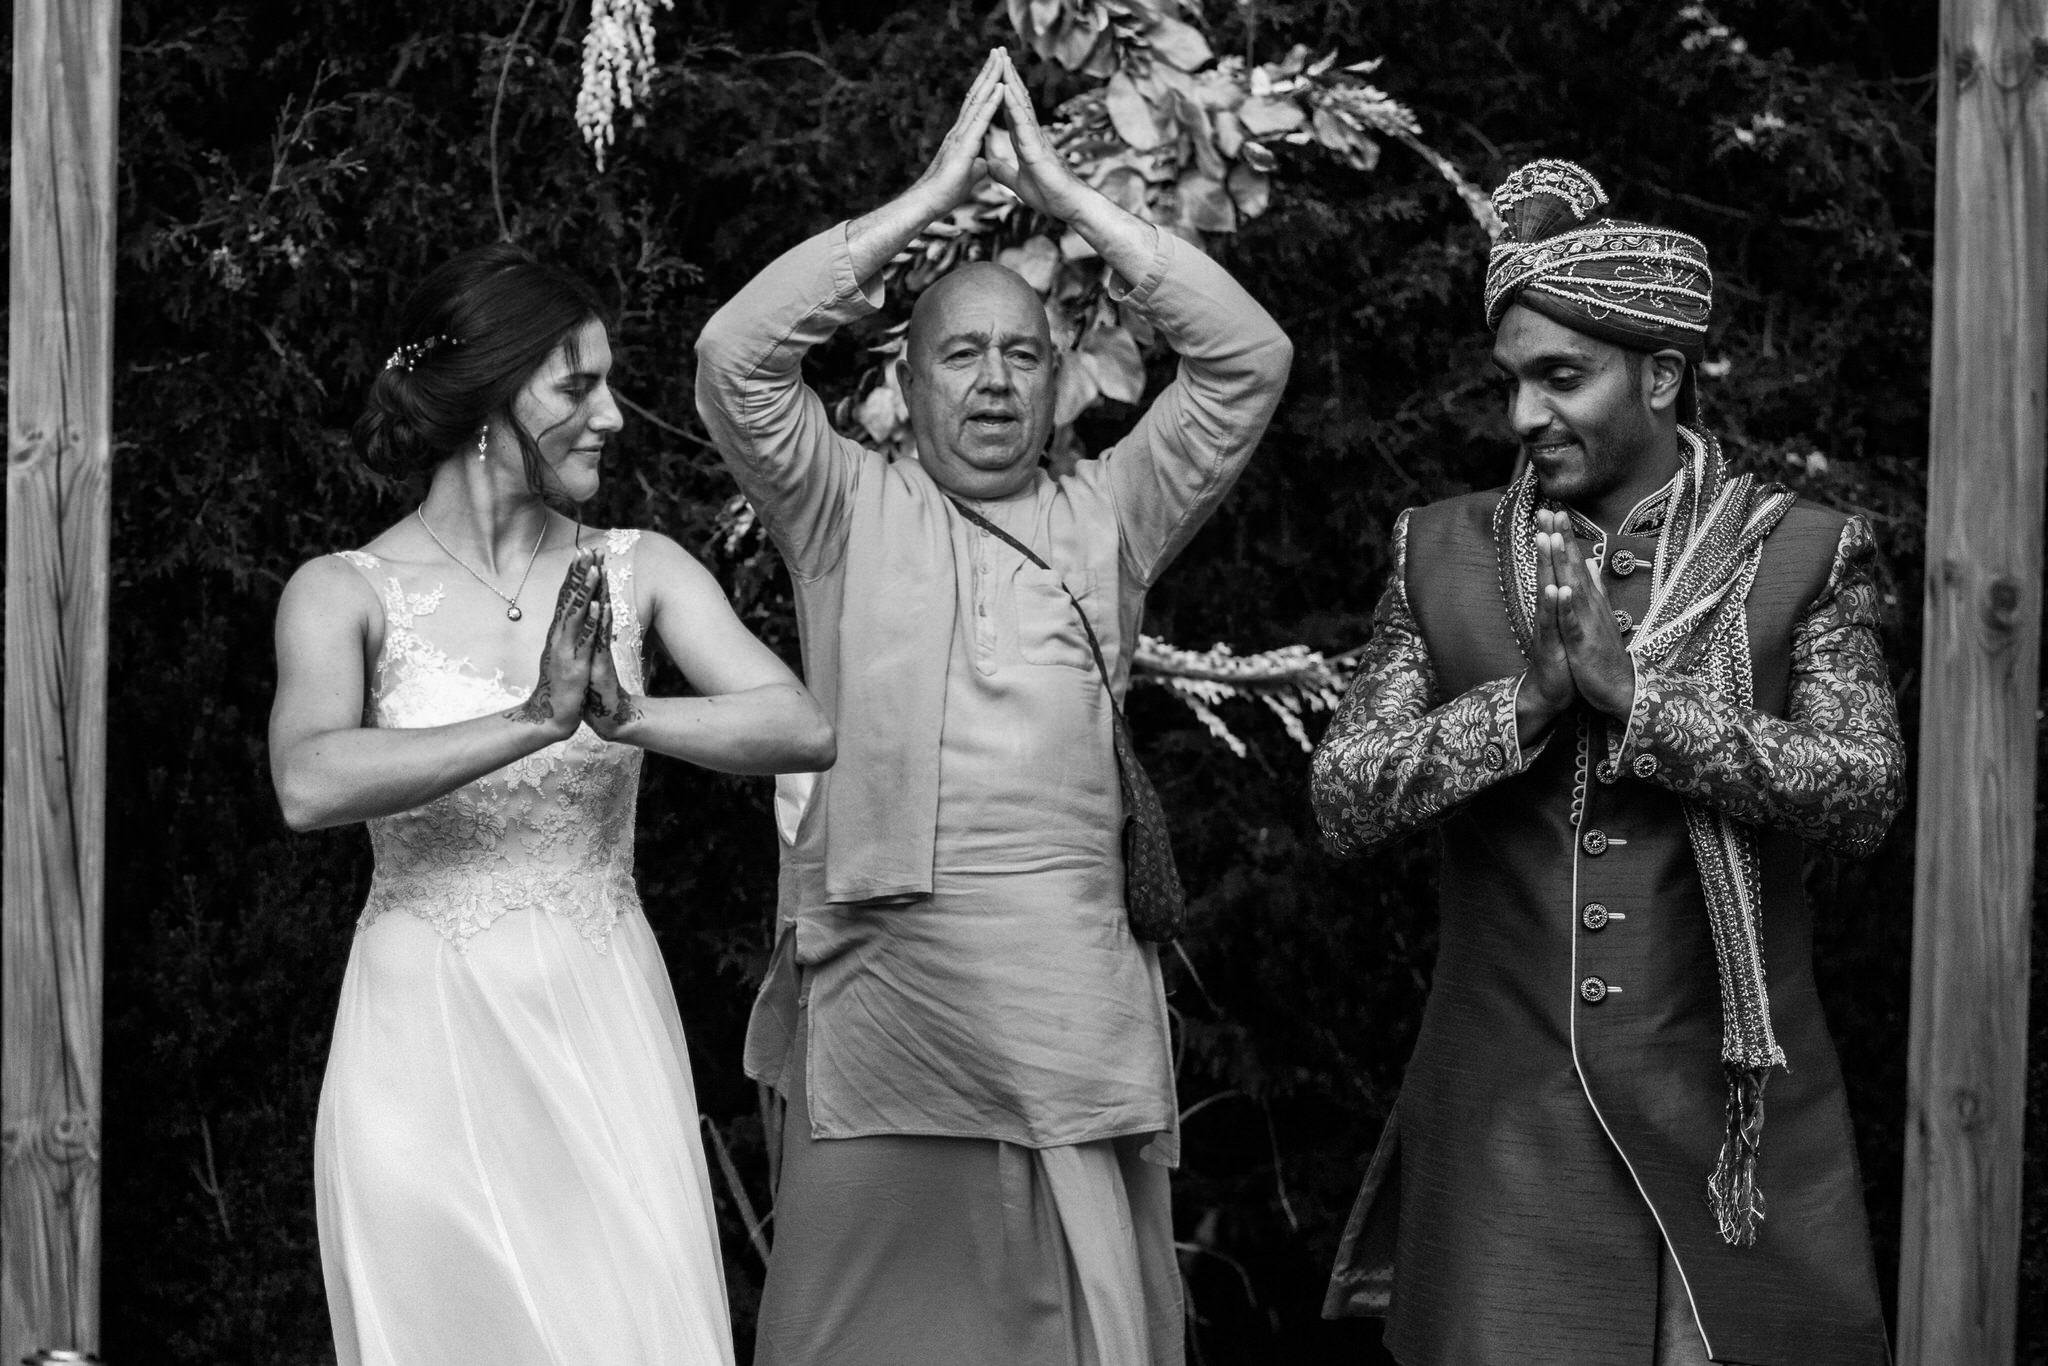 Northview Gardens Wedding - bride and groom hindu wedding tradition